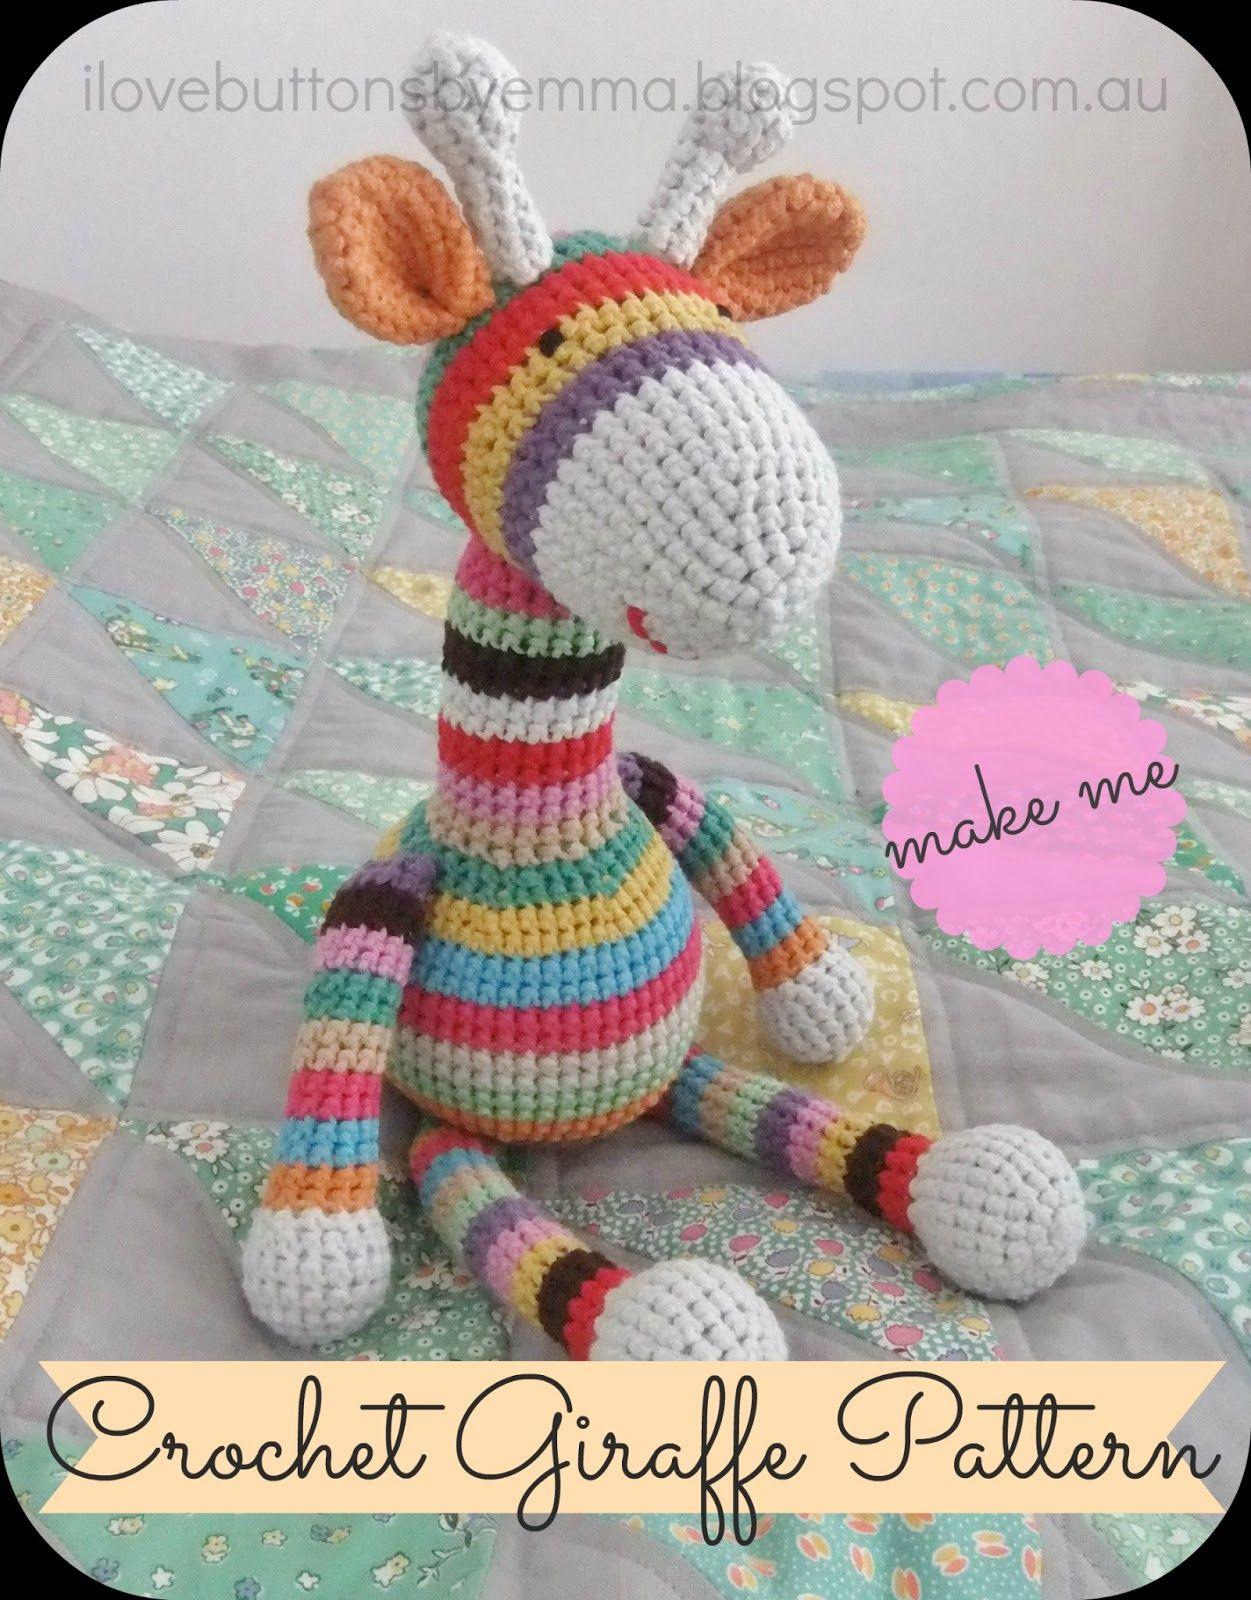 20 Free Amigurumi Patterns to Melt Your Heart | Pinterest | Crochet ...